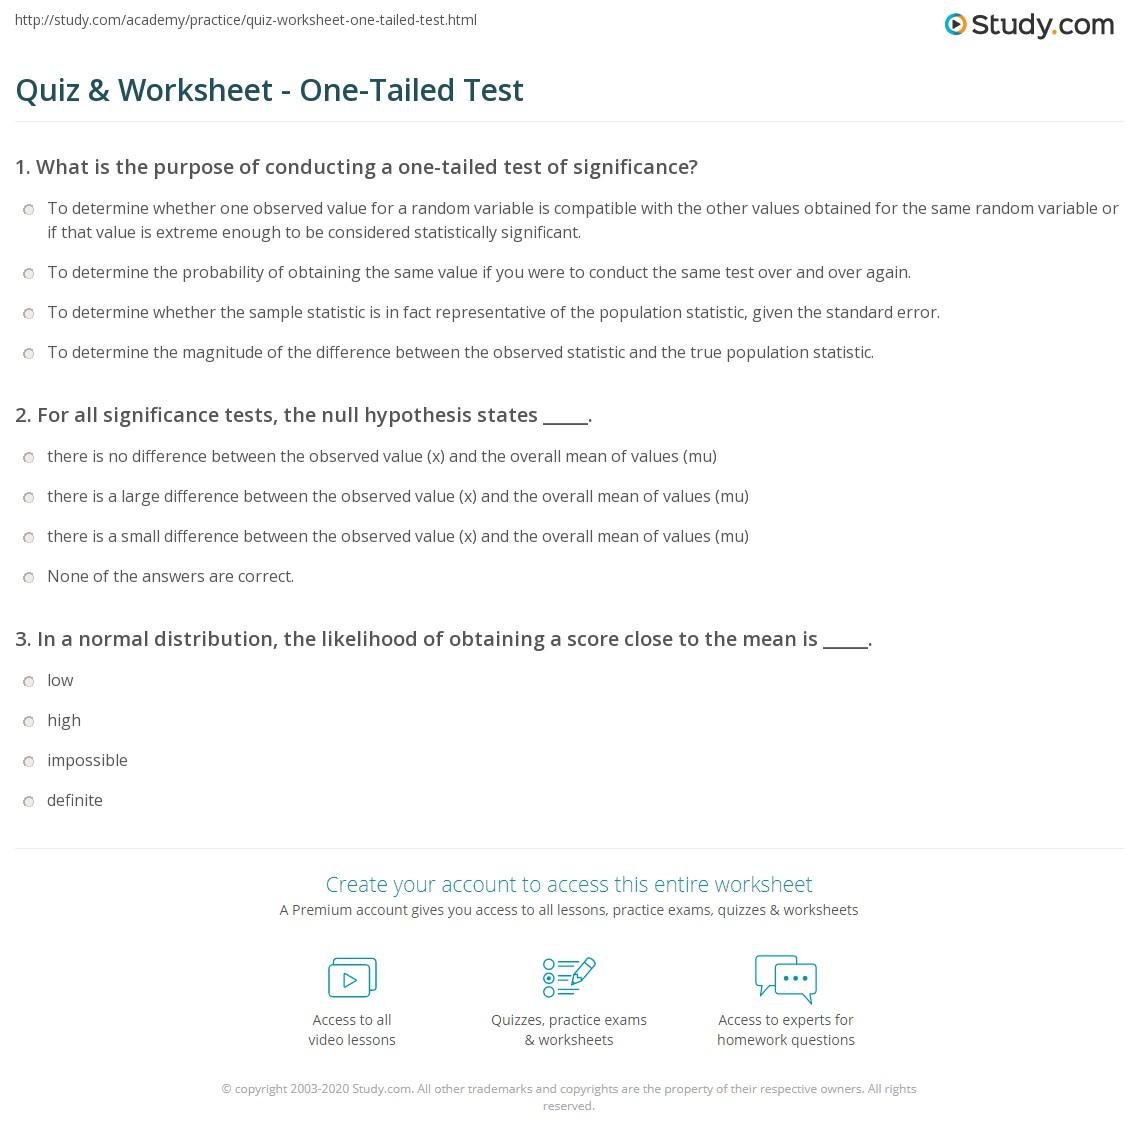 Quiz Worksheet OneTailed Test – Hypothesis Testing Worksheet